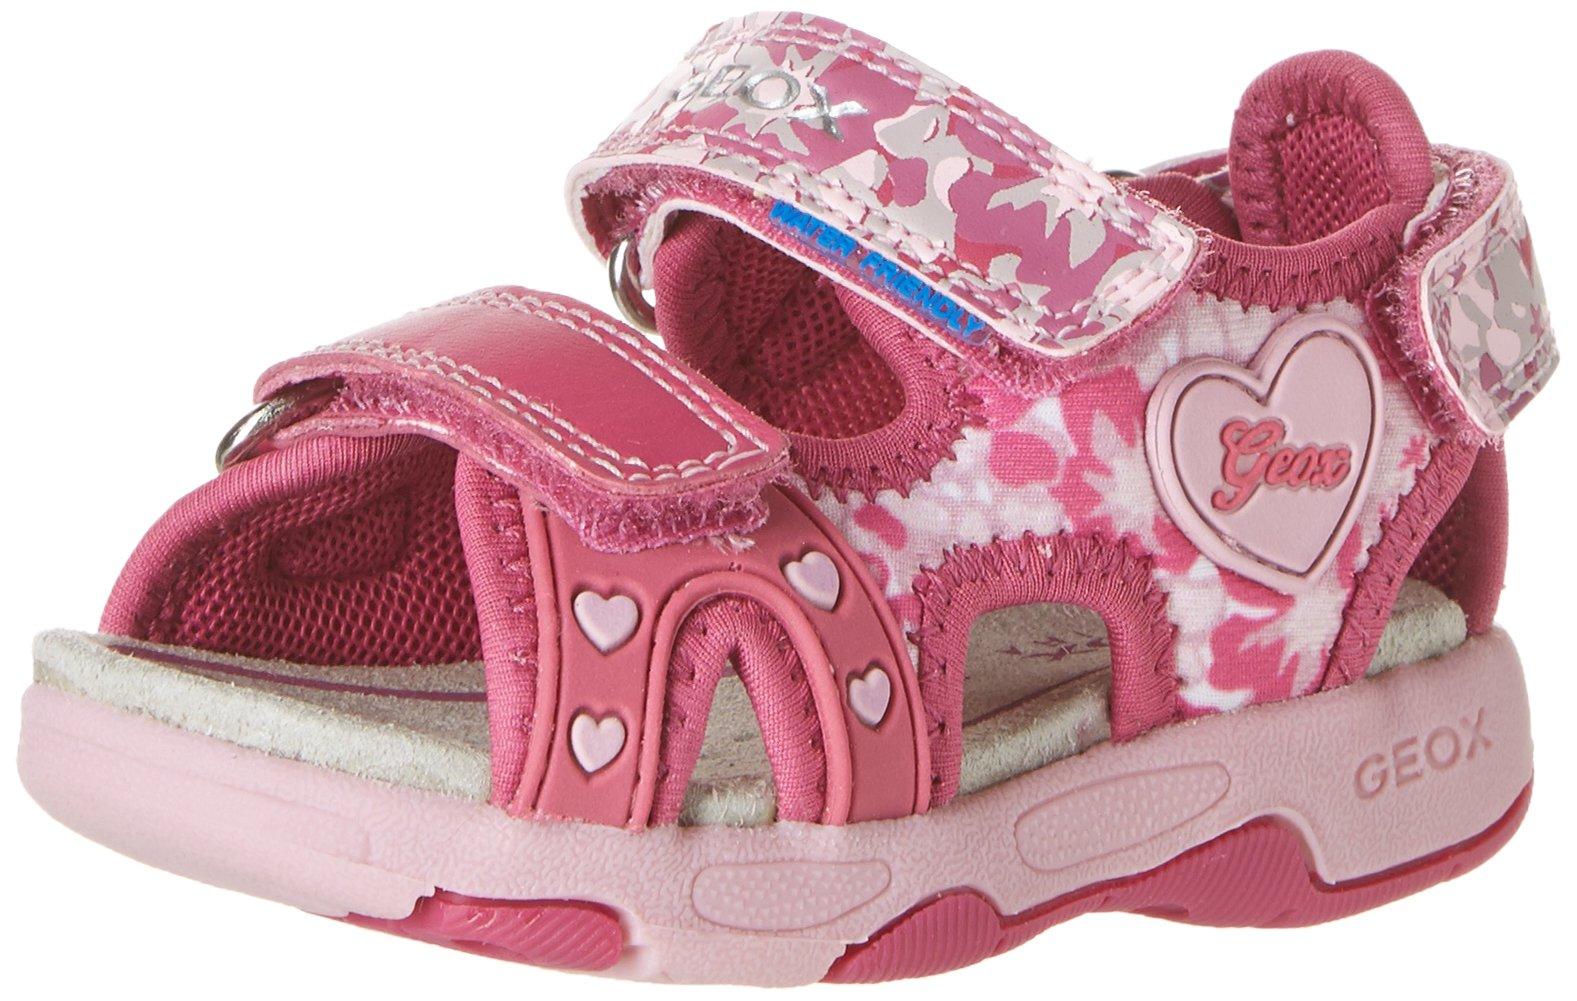 Geox B Sandal Multy Girl 2-K, Fuchsia/Pink, 22 EU(6.5 M US Toddler) by Geox